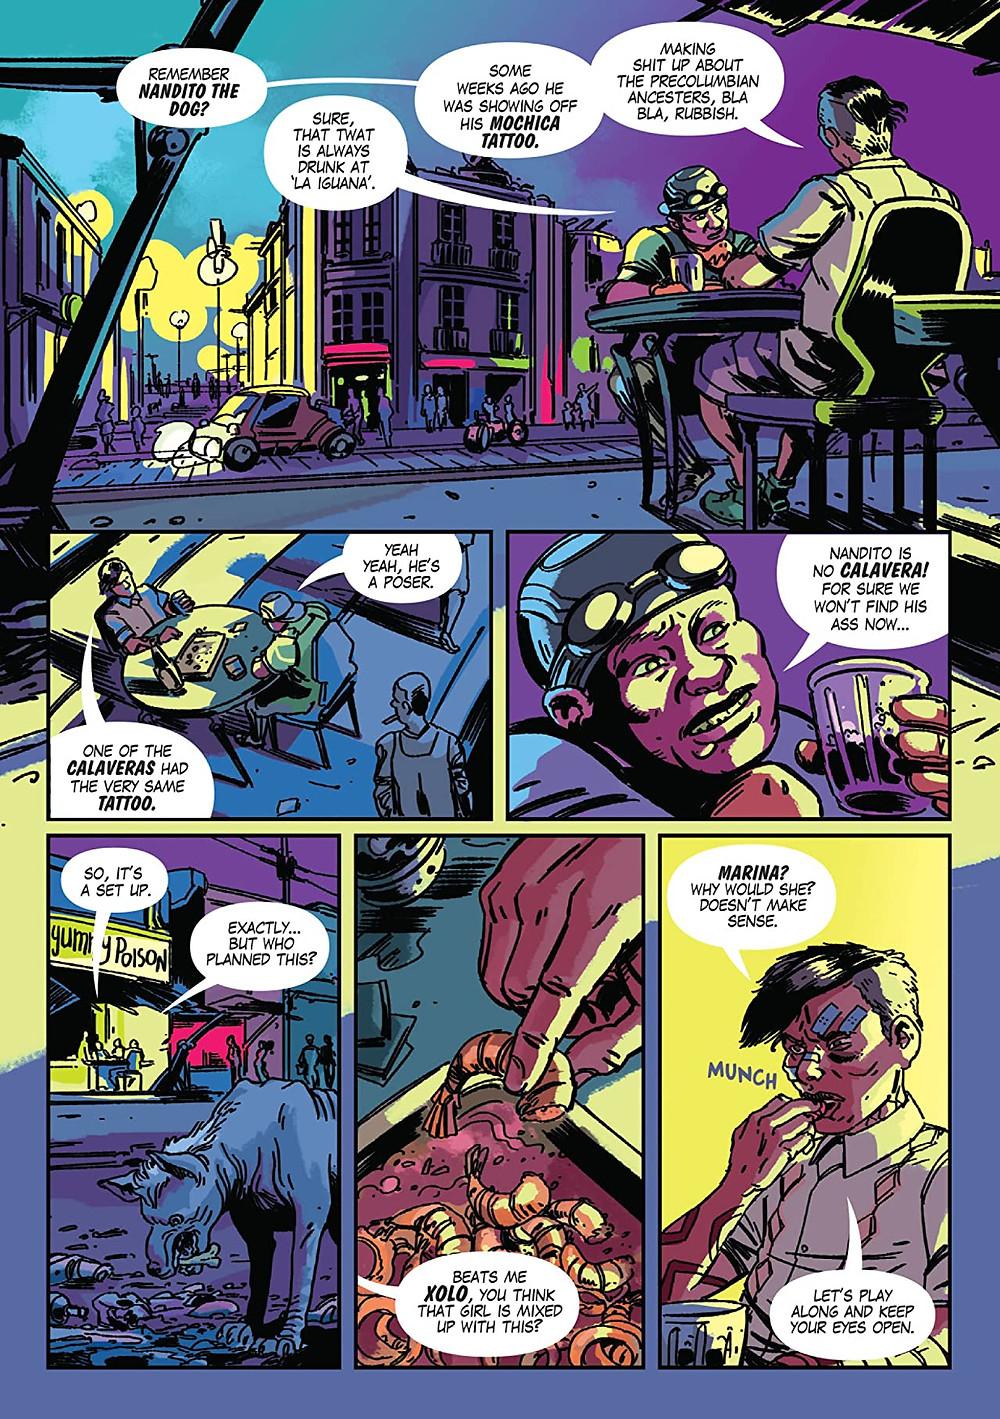 Trujillo, Page 3, Tacu Tinta Press, Gustaffo Vargas